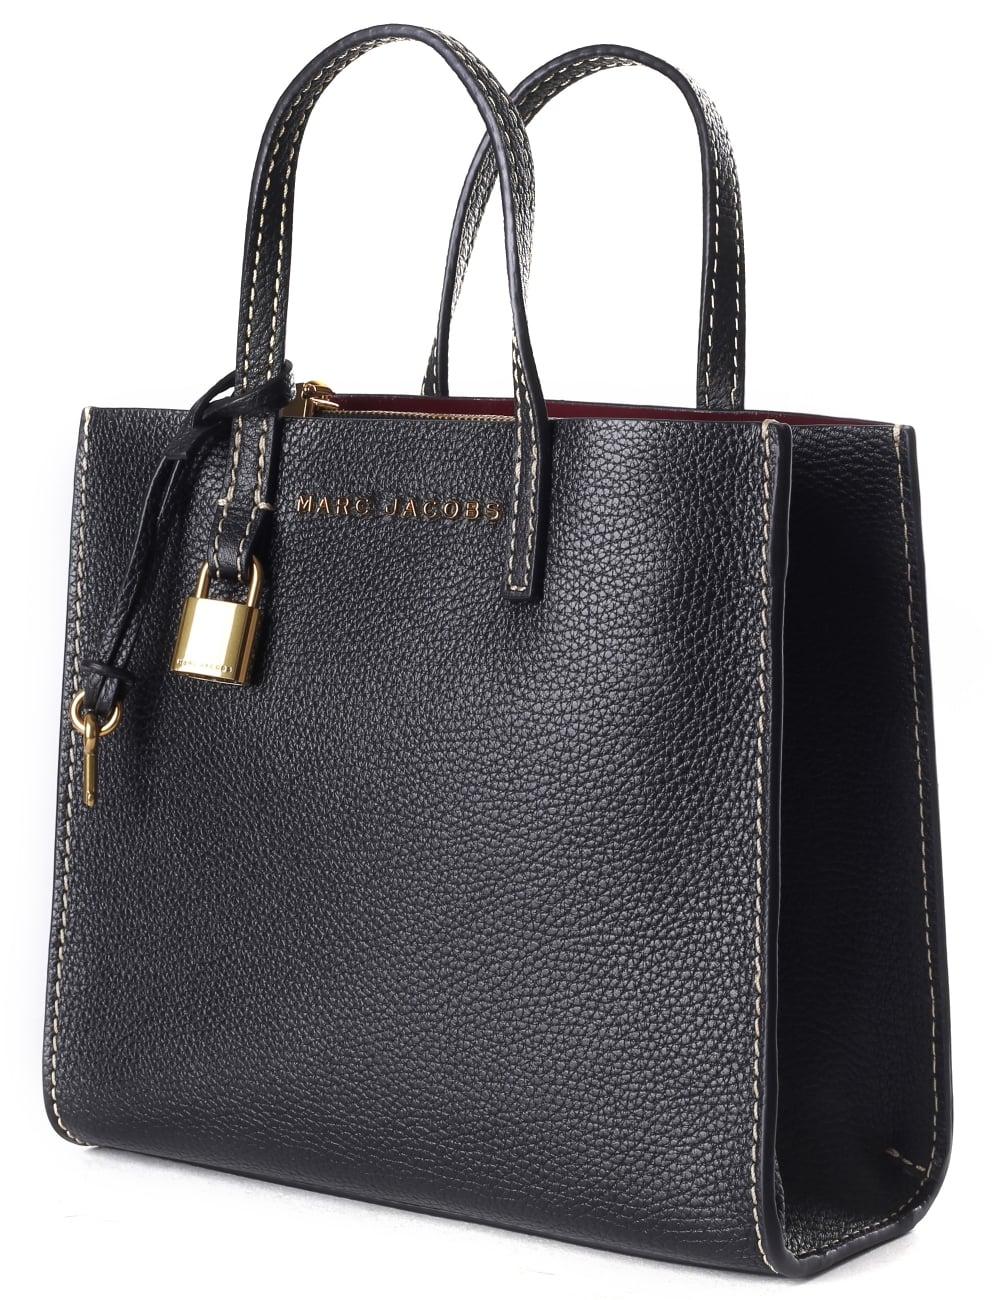 23c4ecf2dc2f Marc Jacobs Women s The Mini Grind Bag Black Gold